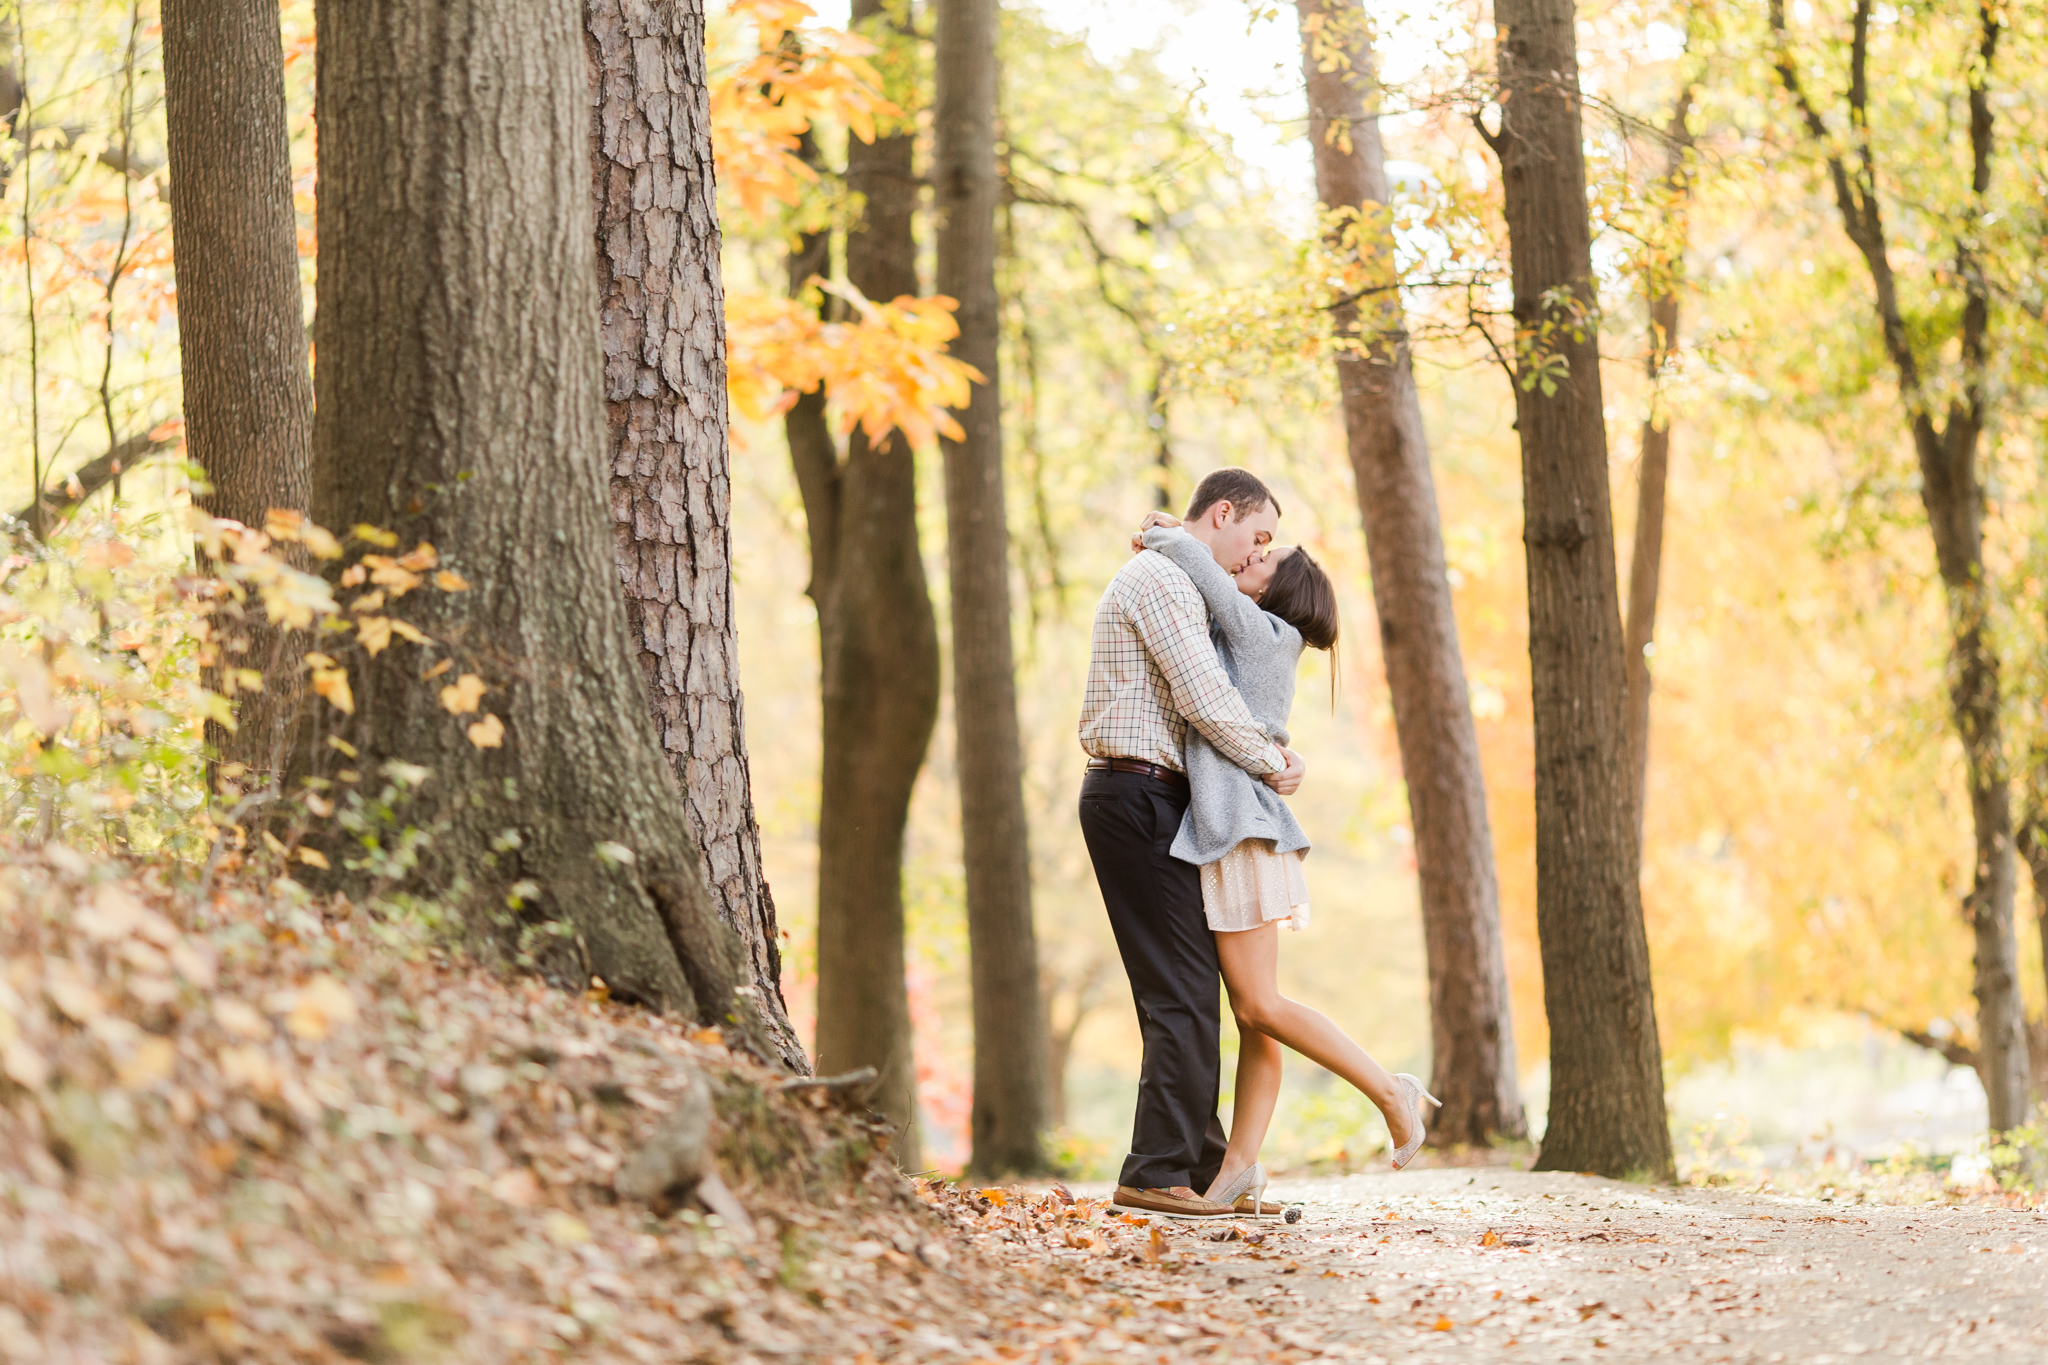 Ashley-Amber-Photo-Outdoor-Wedding-Photography-165259.jpg